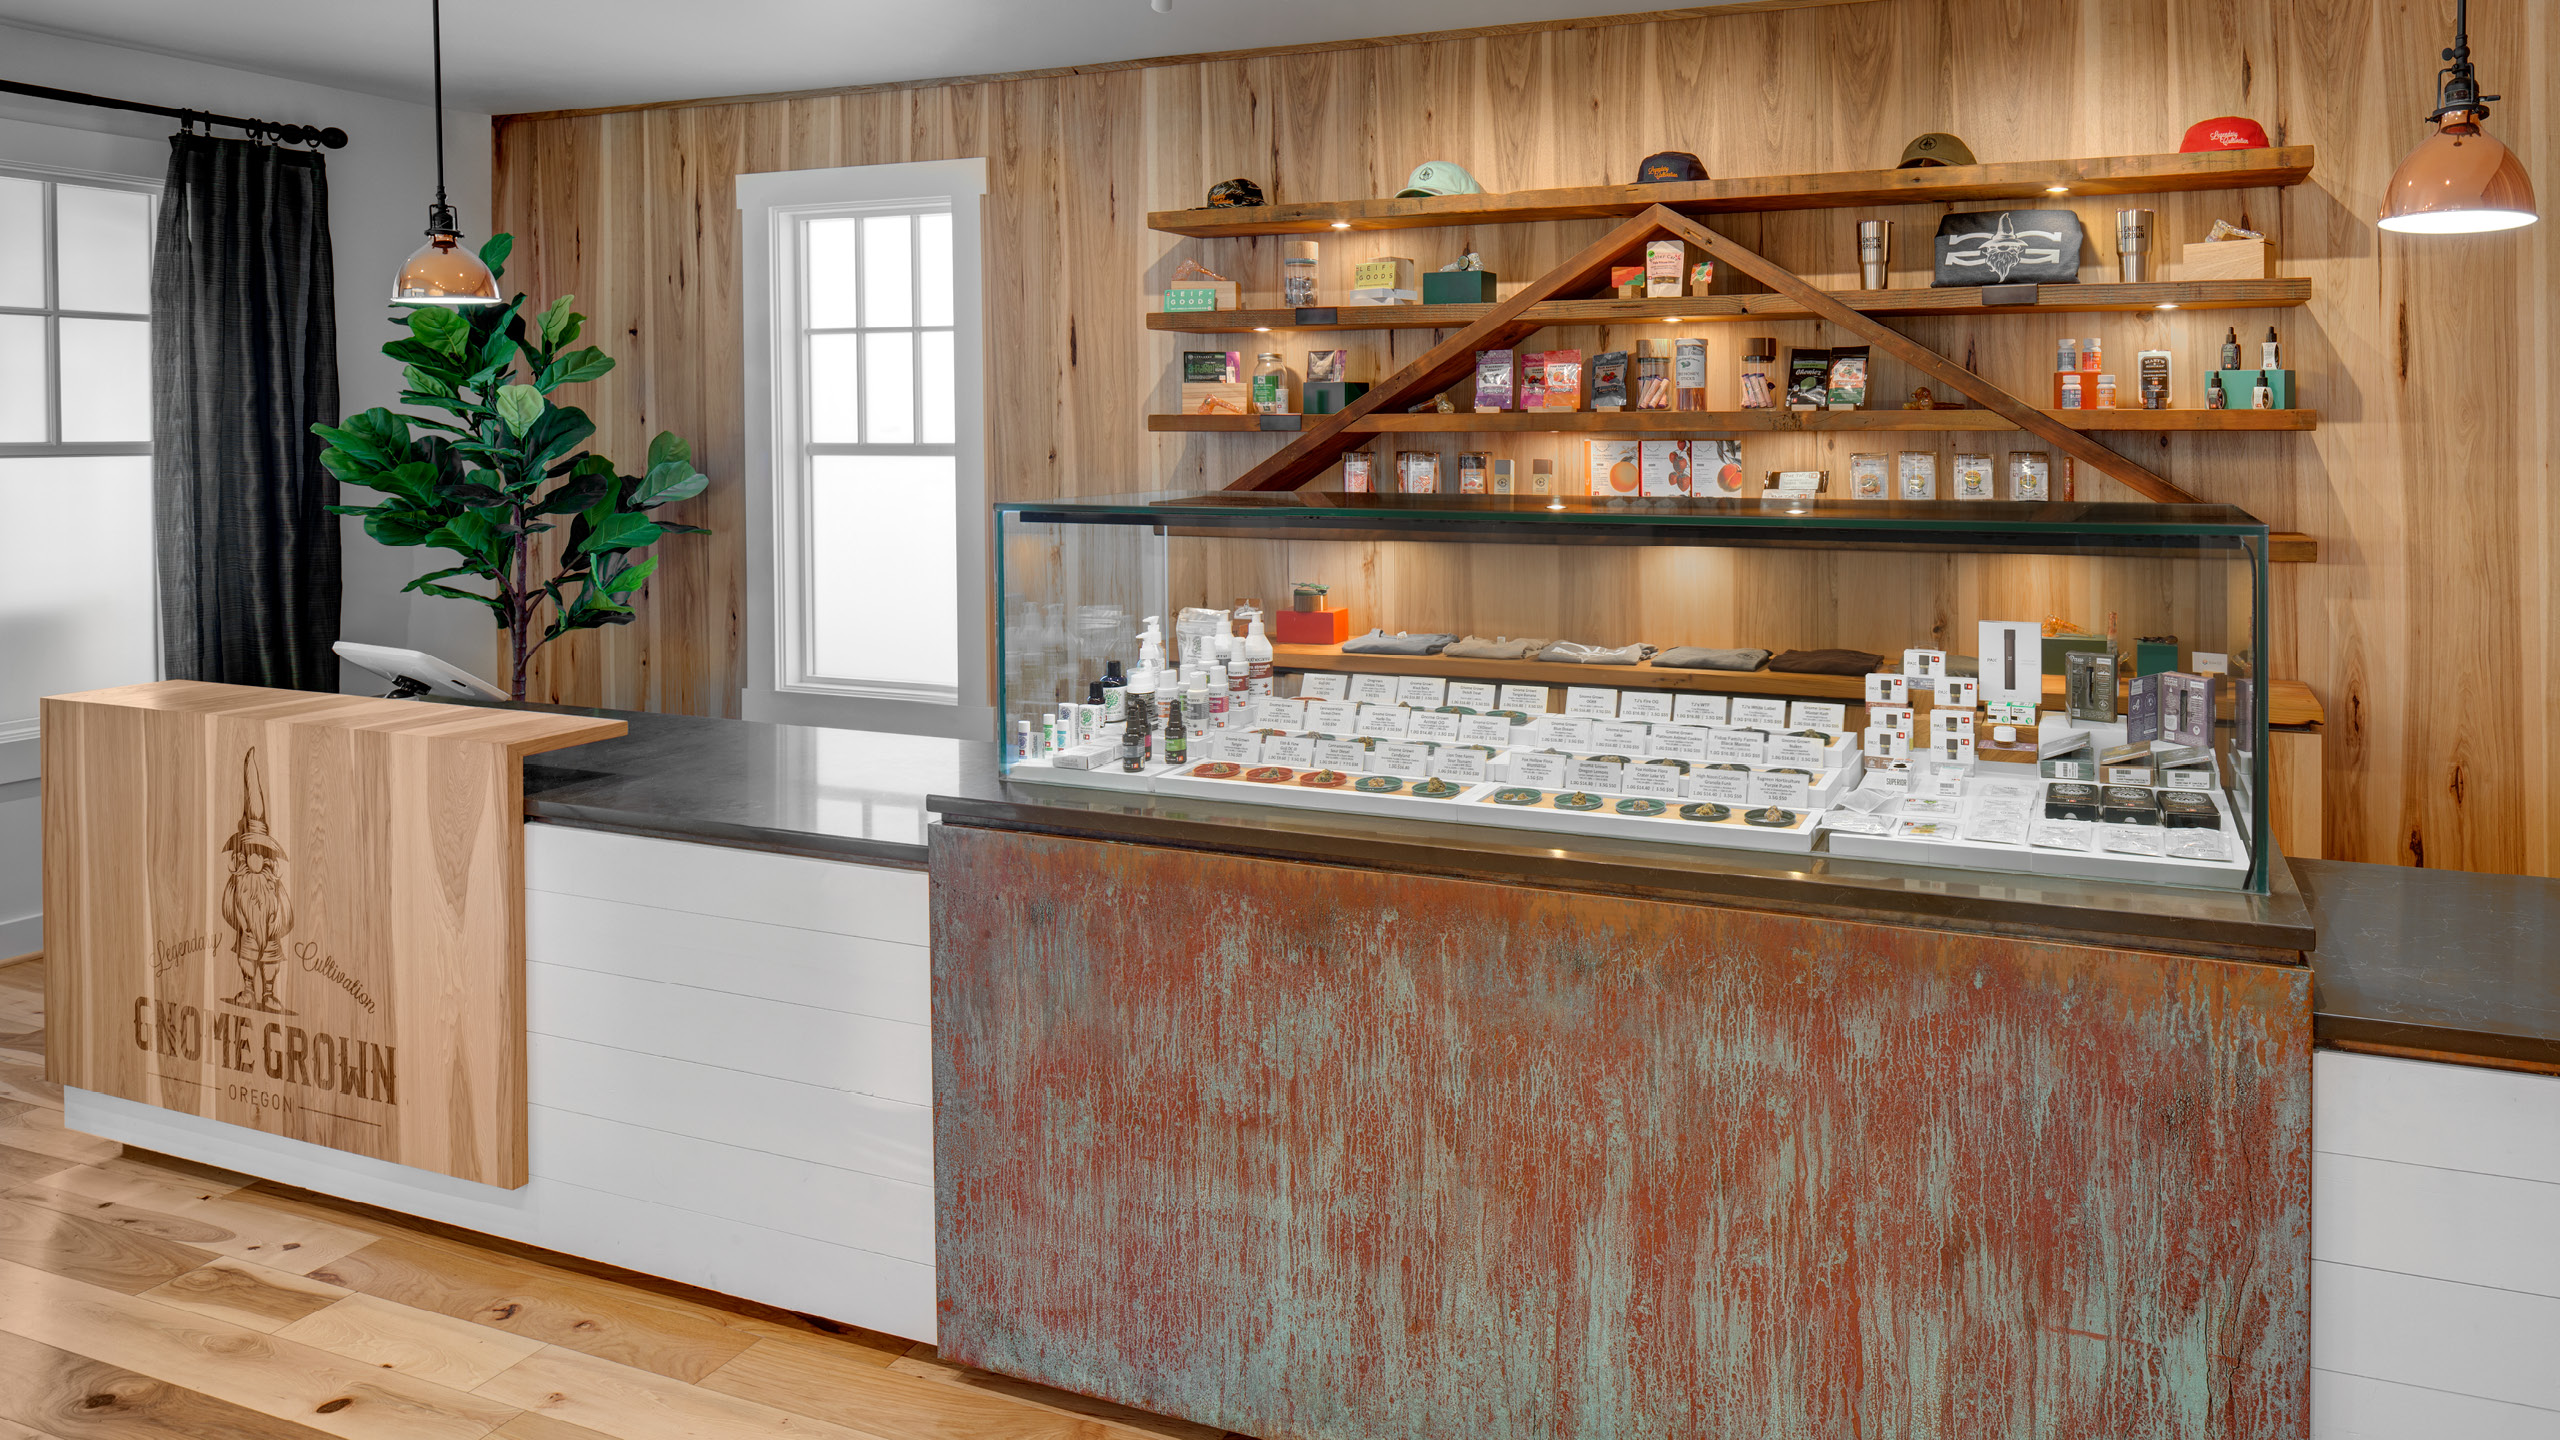 Gnome Grown Retail Interior Design by High Road Design Studio